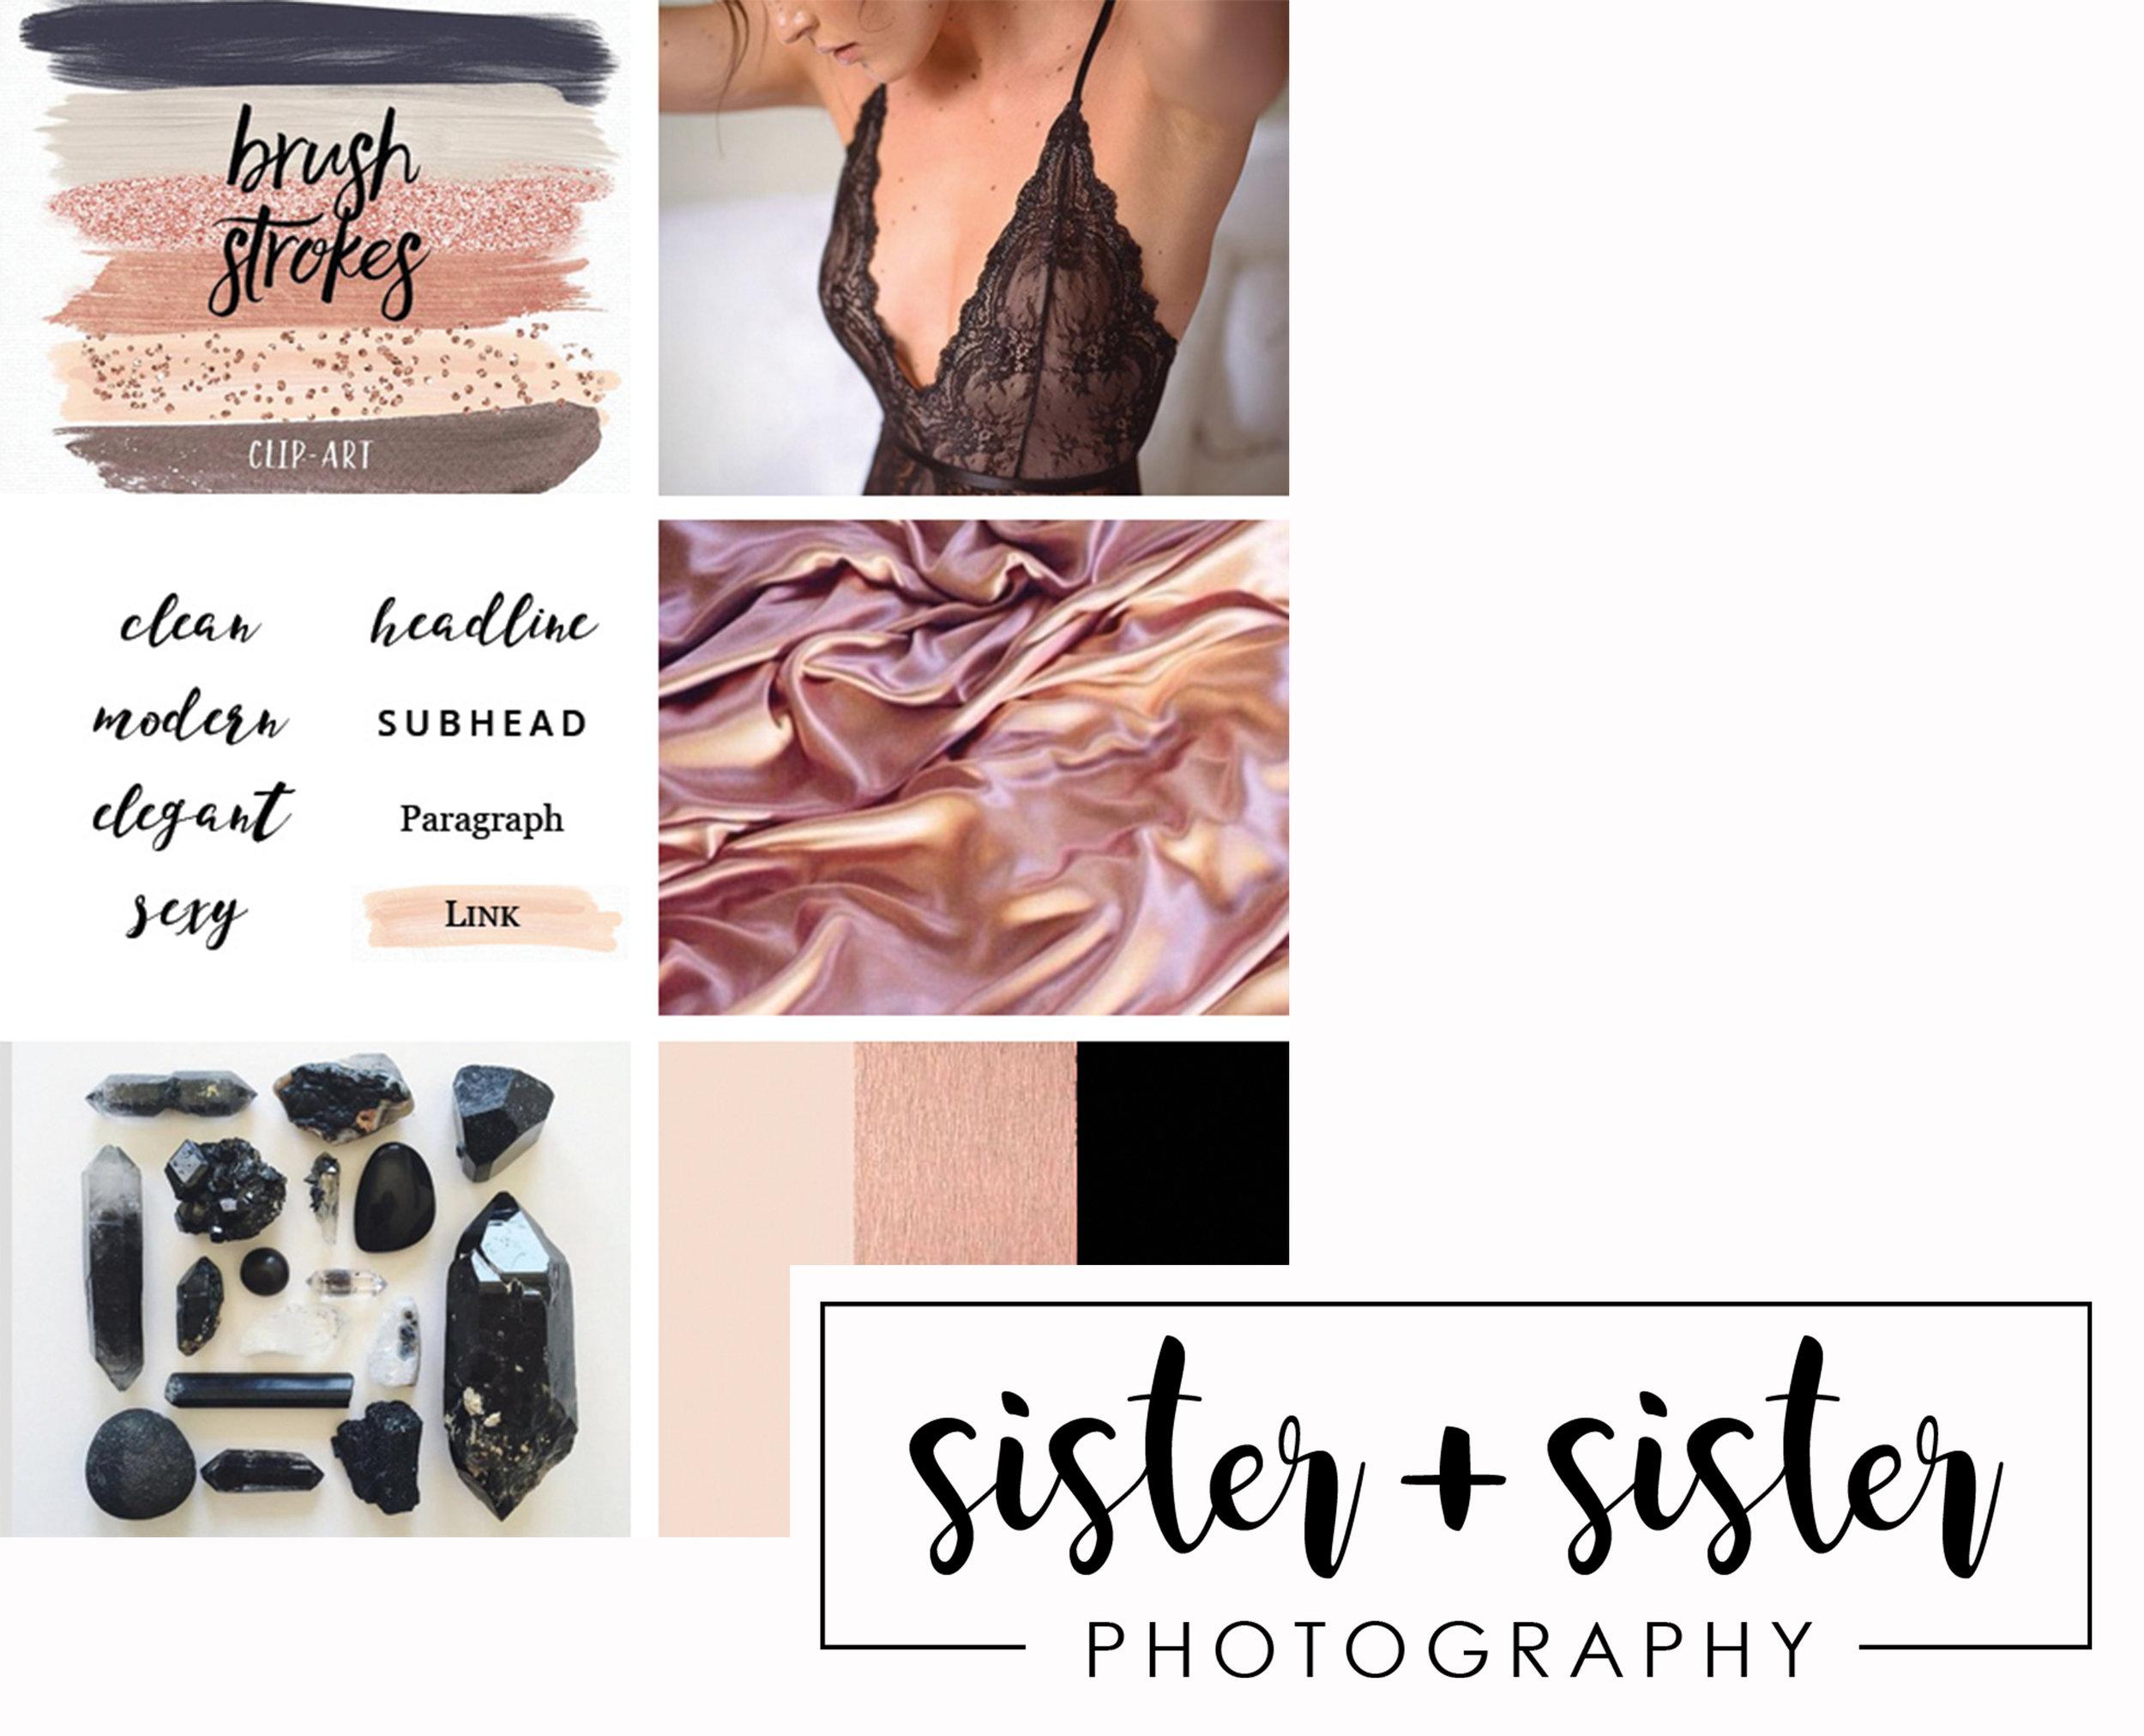 brandidentity-sister+sister.jpg